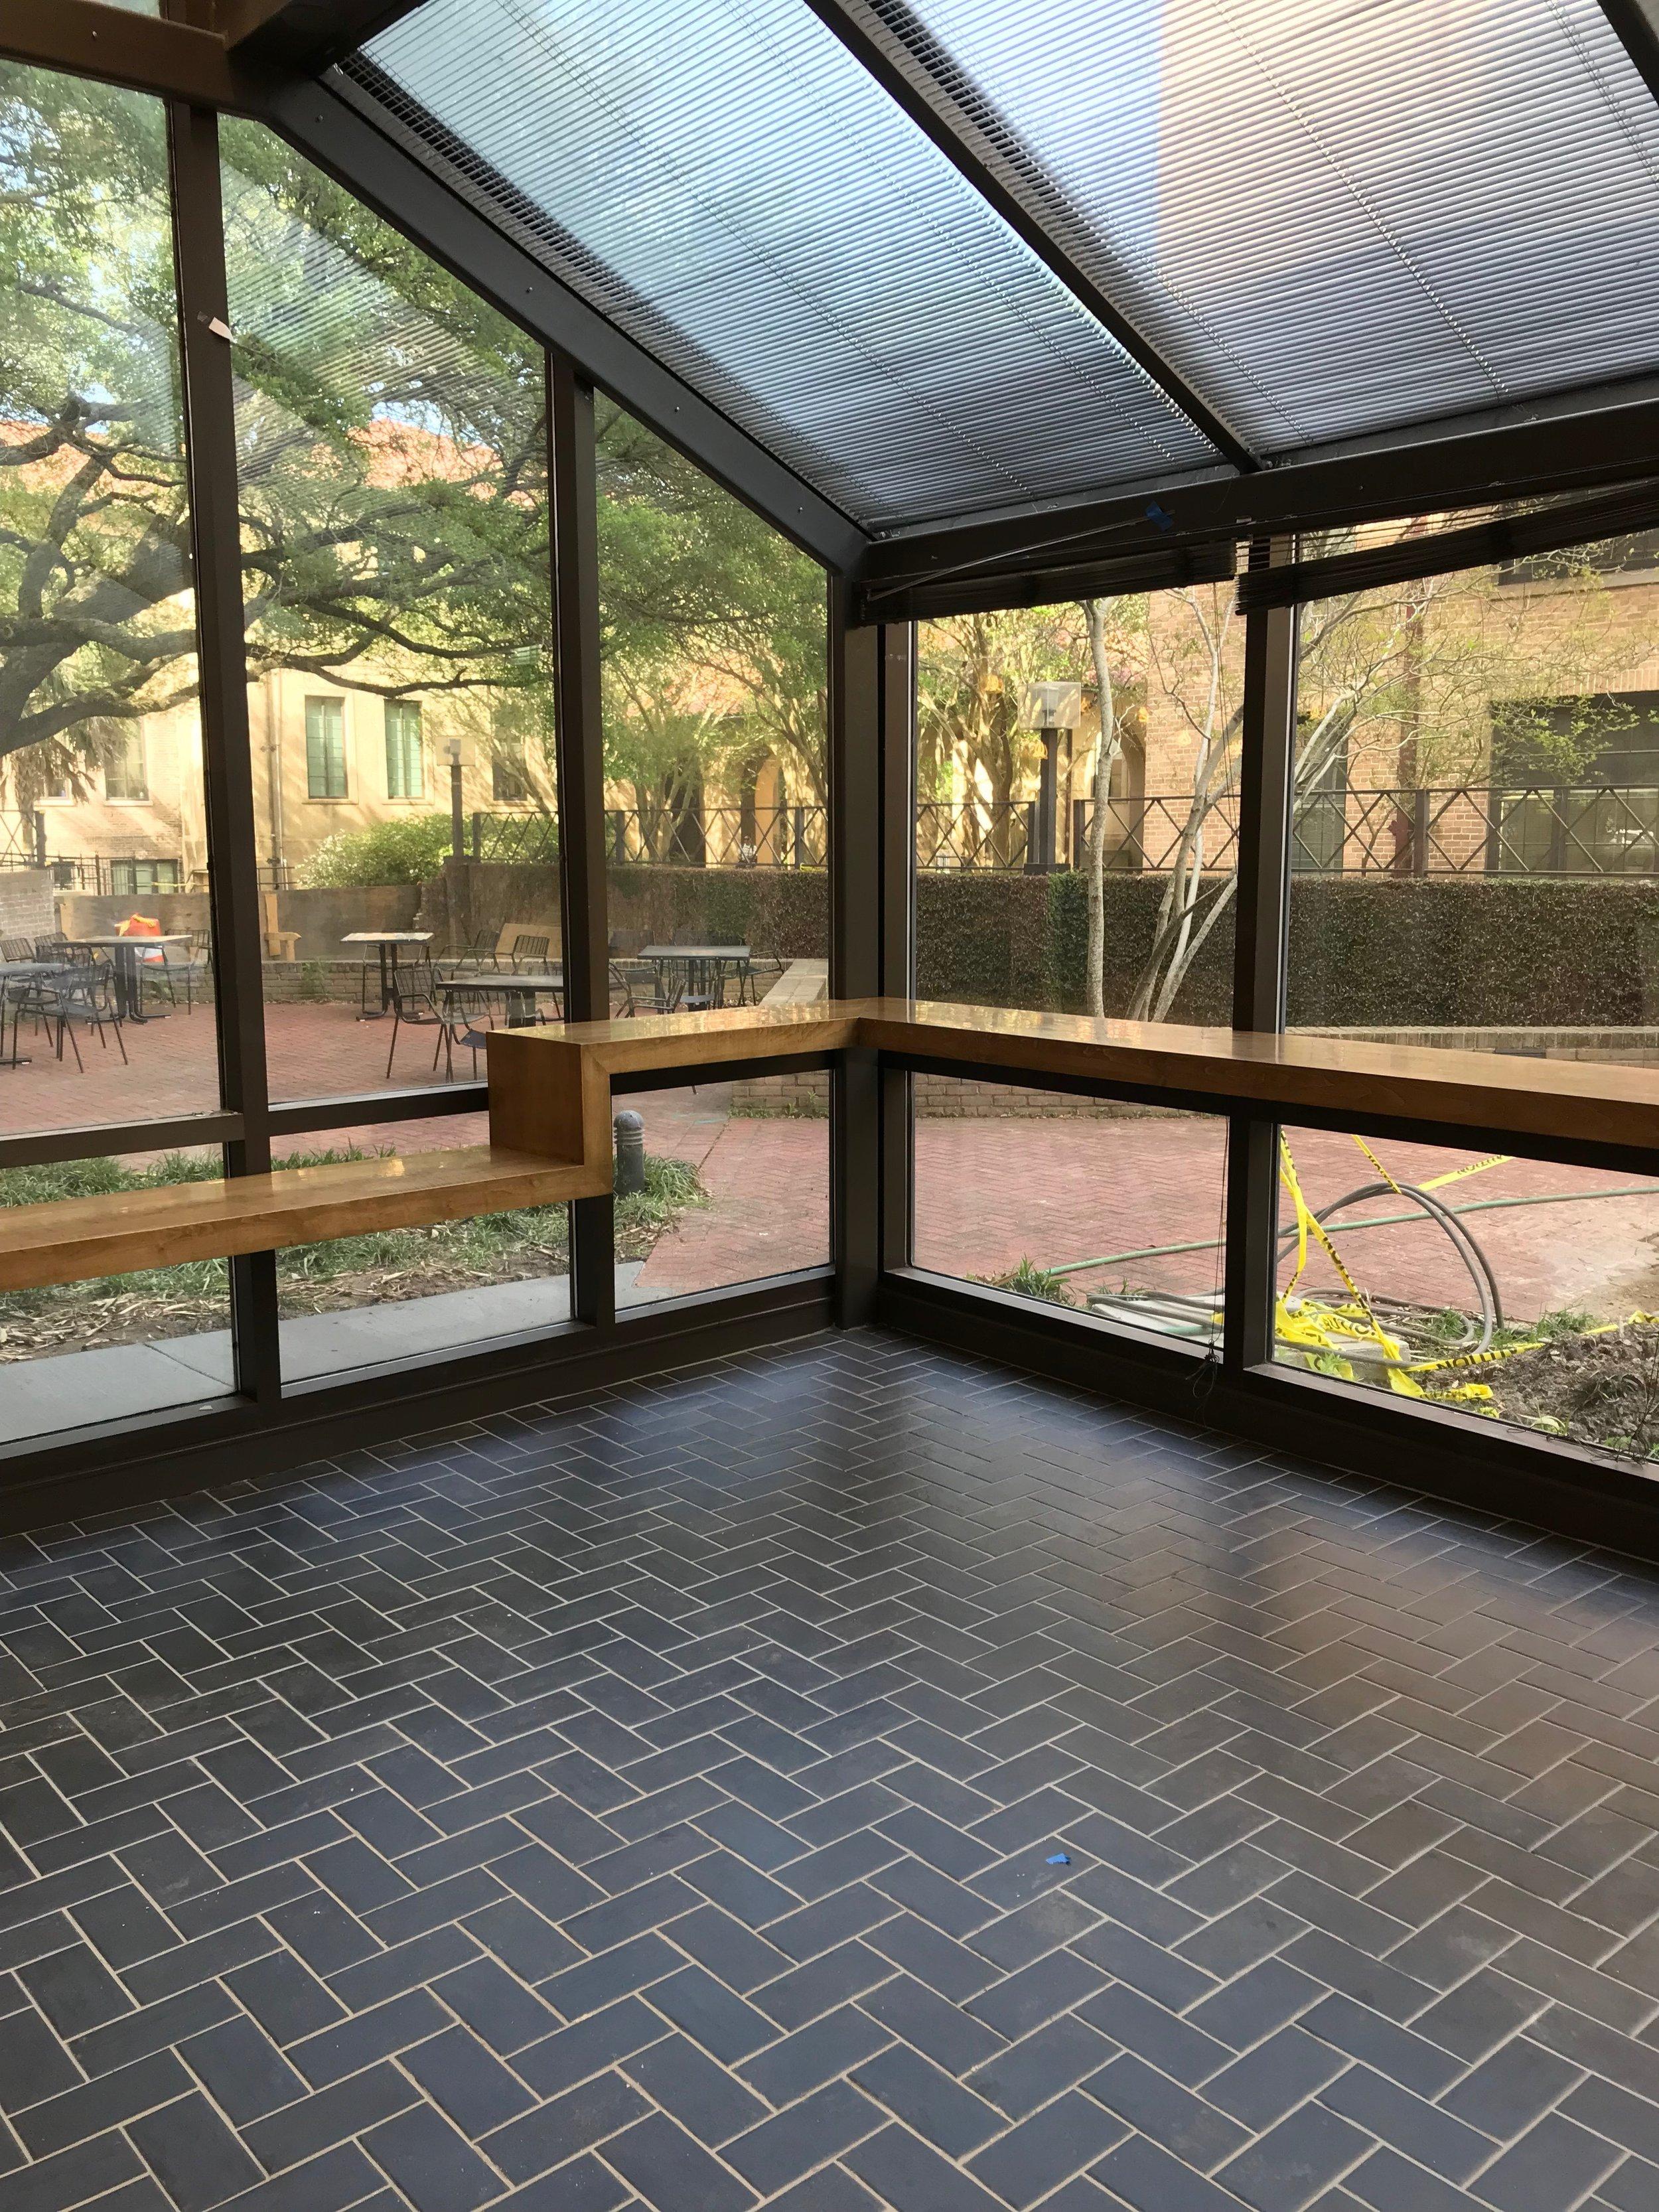 LSU Design School / City Pork